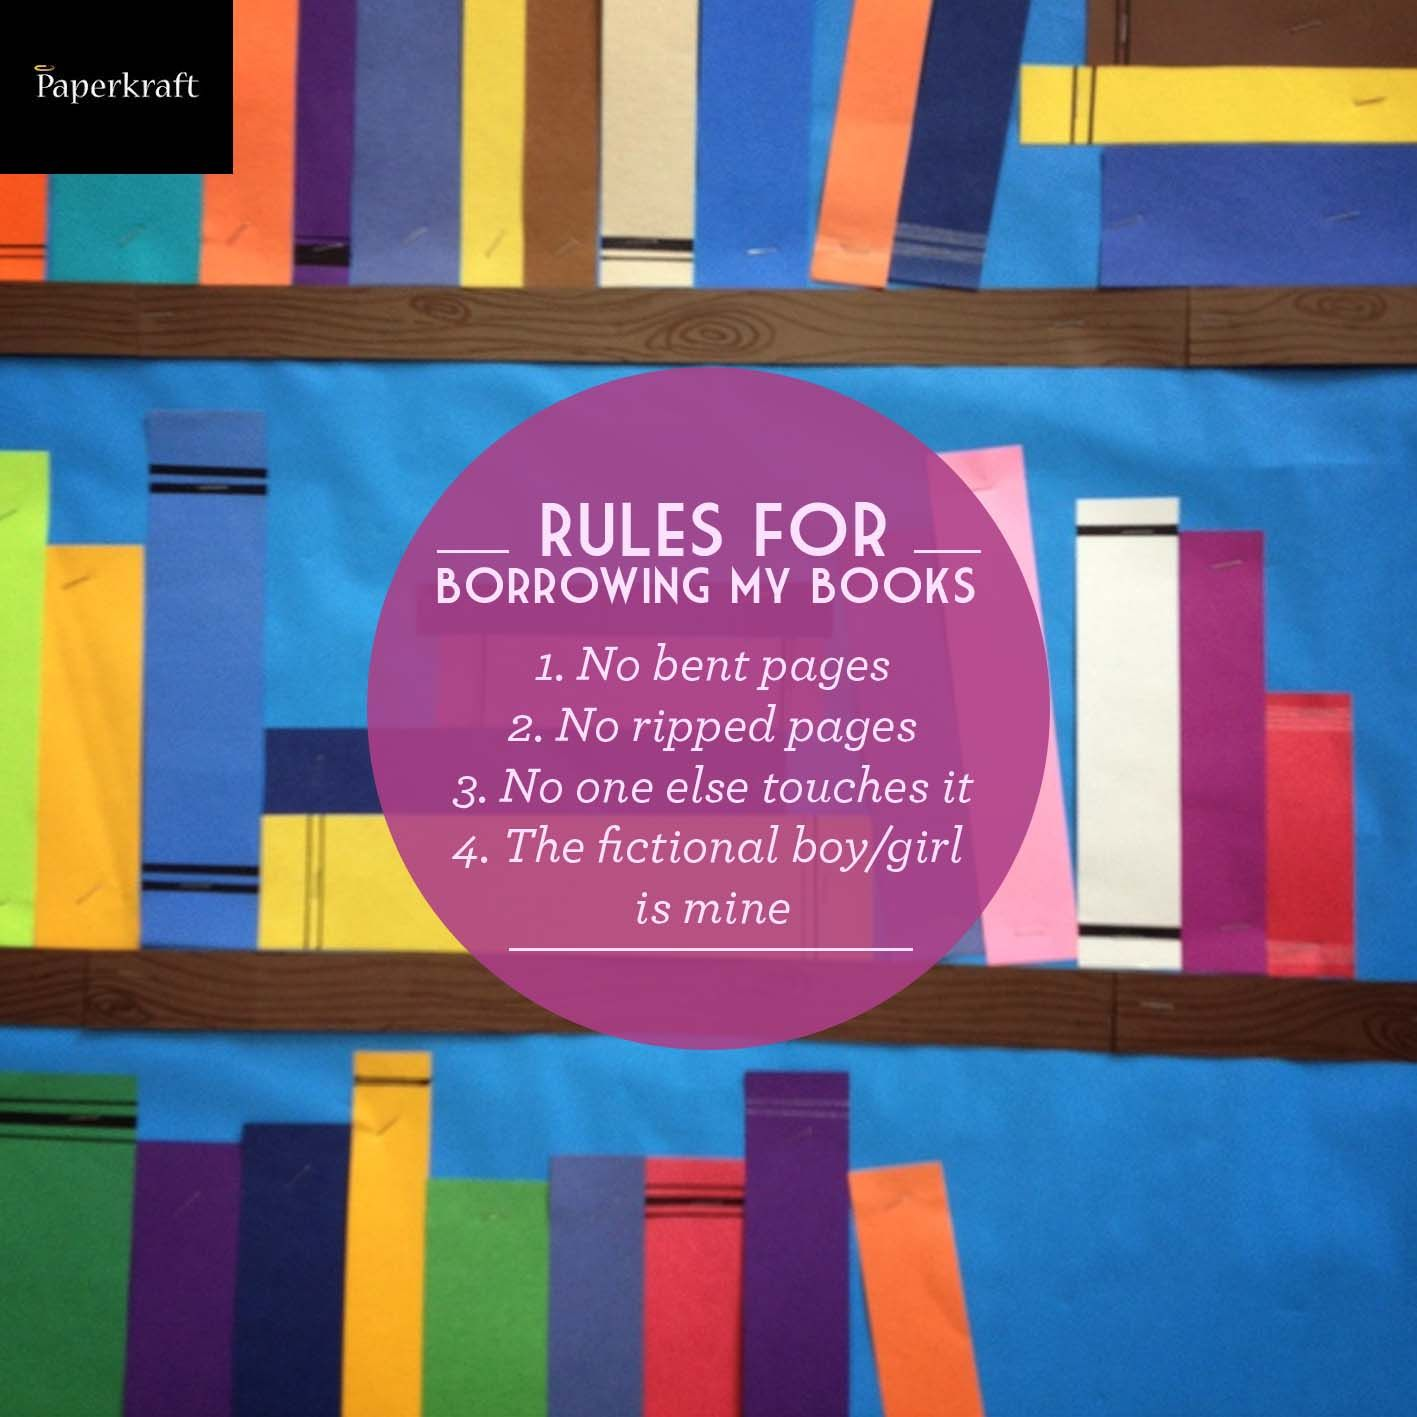 #Book #Rules